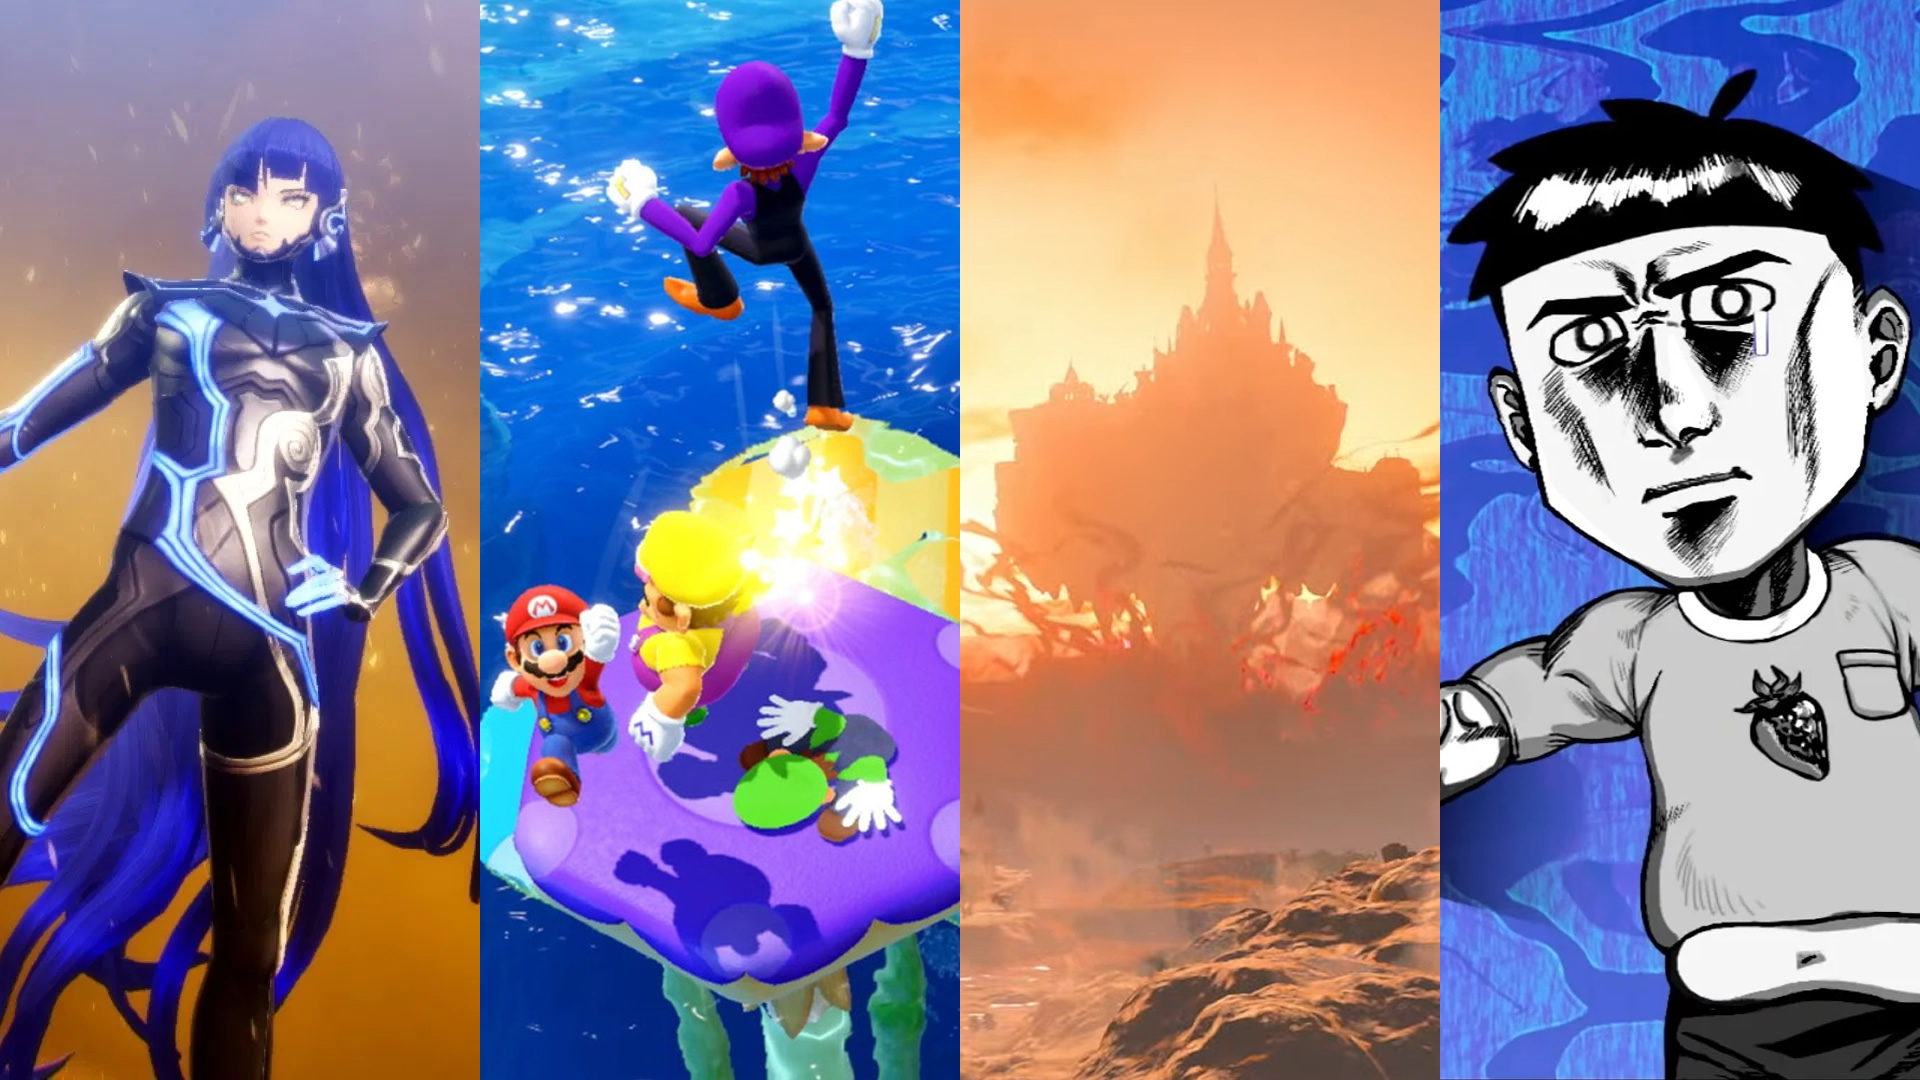 Nintendo E3 2021 Highlights, Reveals and Trailers